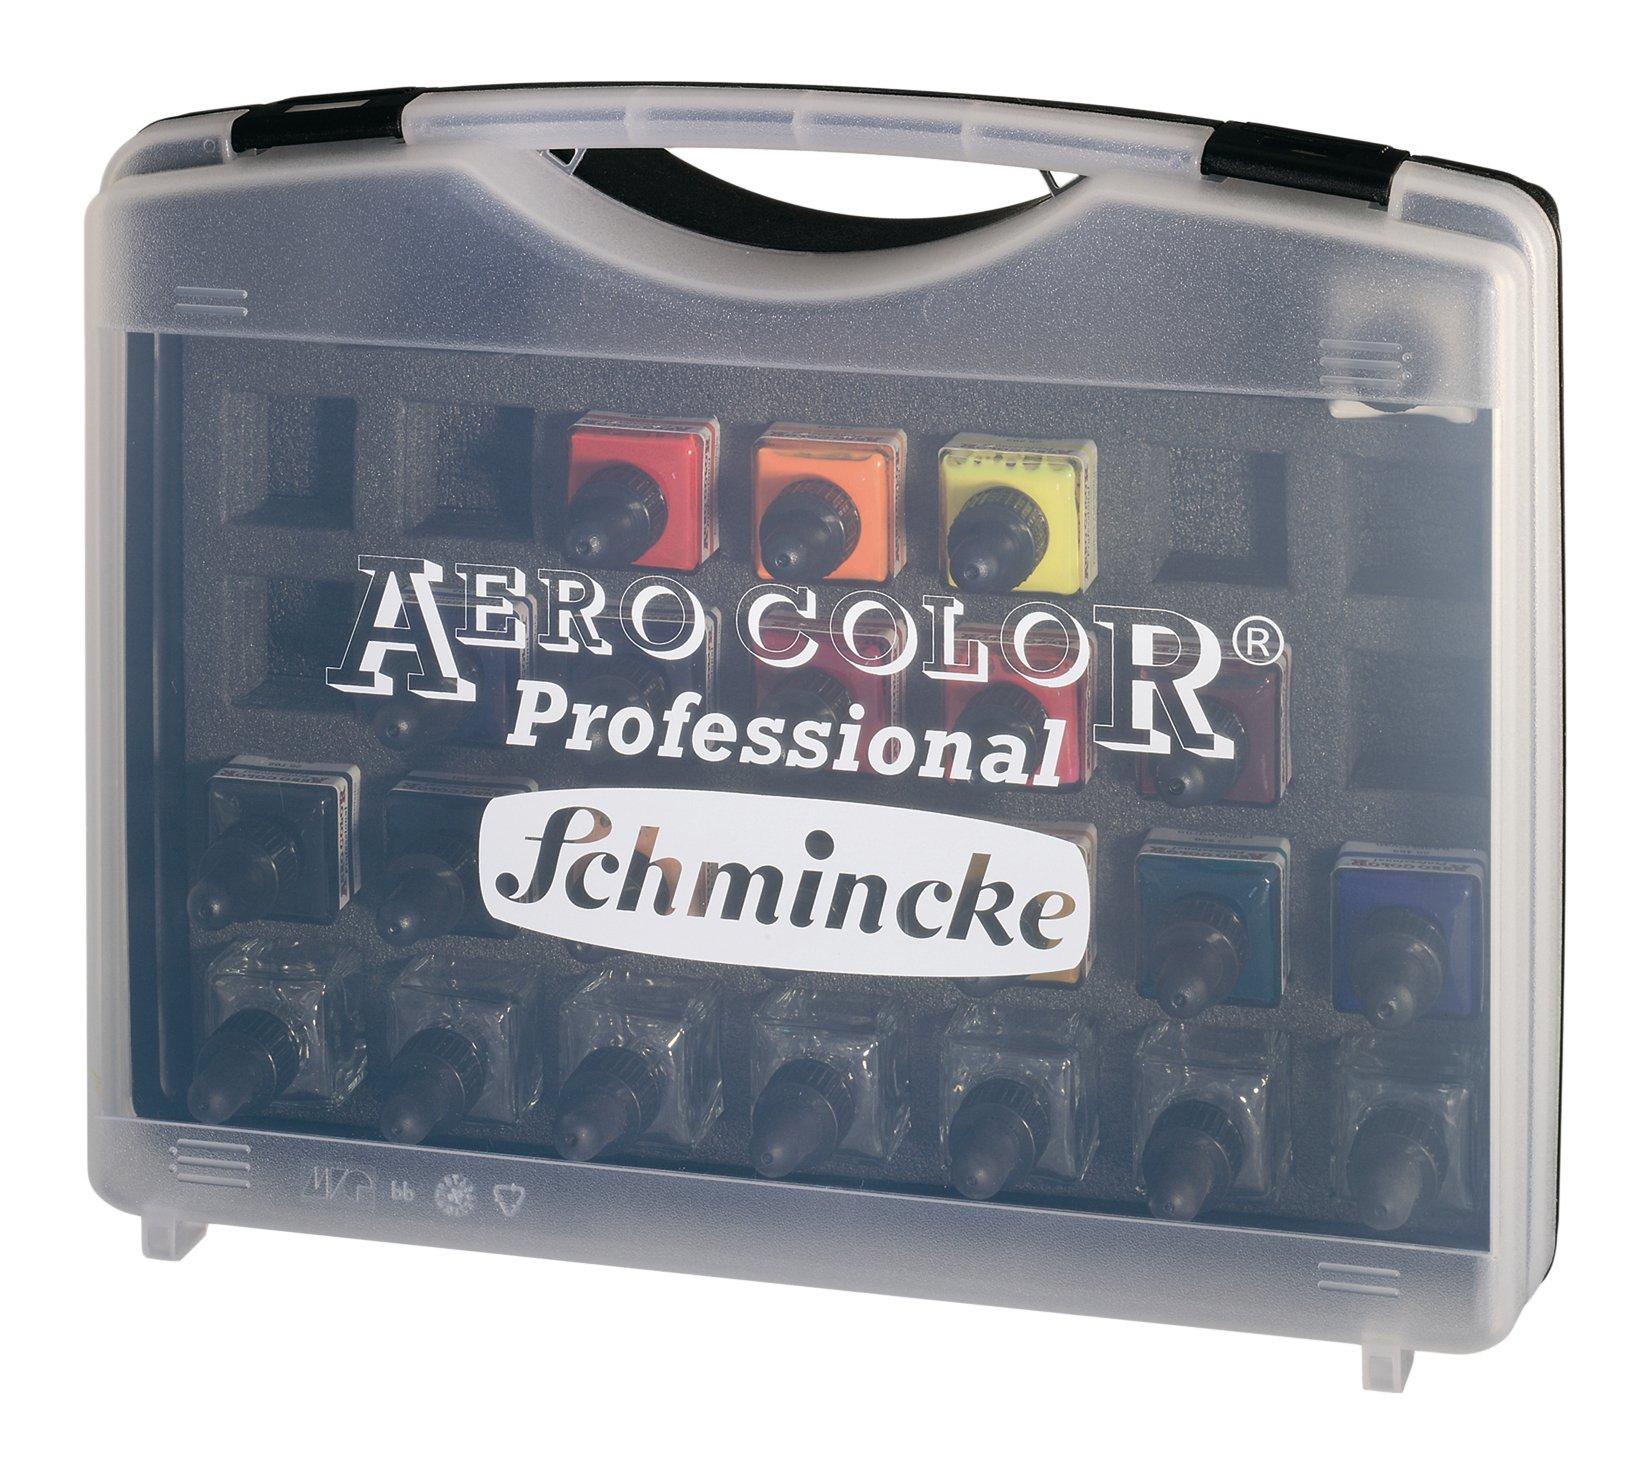 Schmincke Aero Color Professional Airbrush Ink Set in Plastic Case, 28ml Bottles, 16-Color Set, 1 Set Each (81124097)